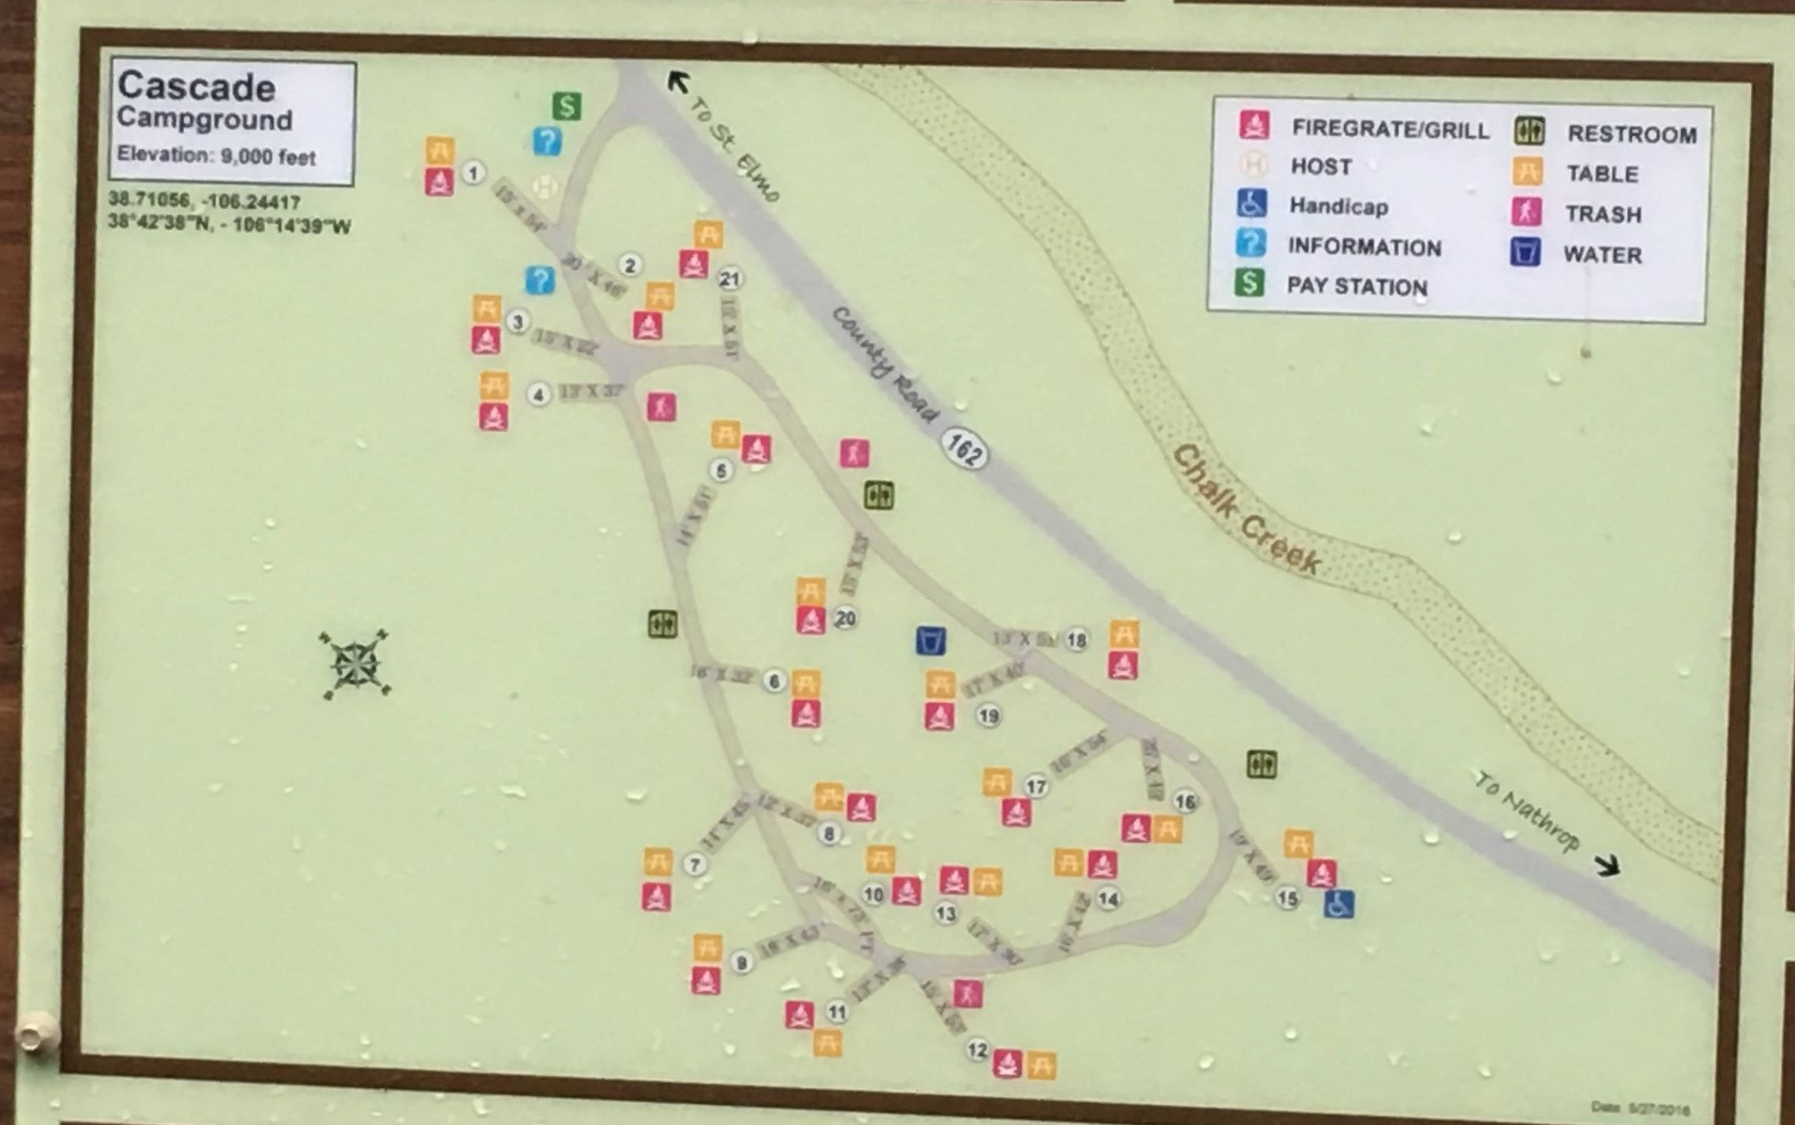 Cascade campground map